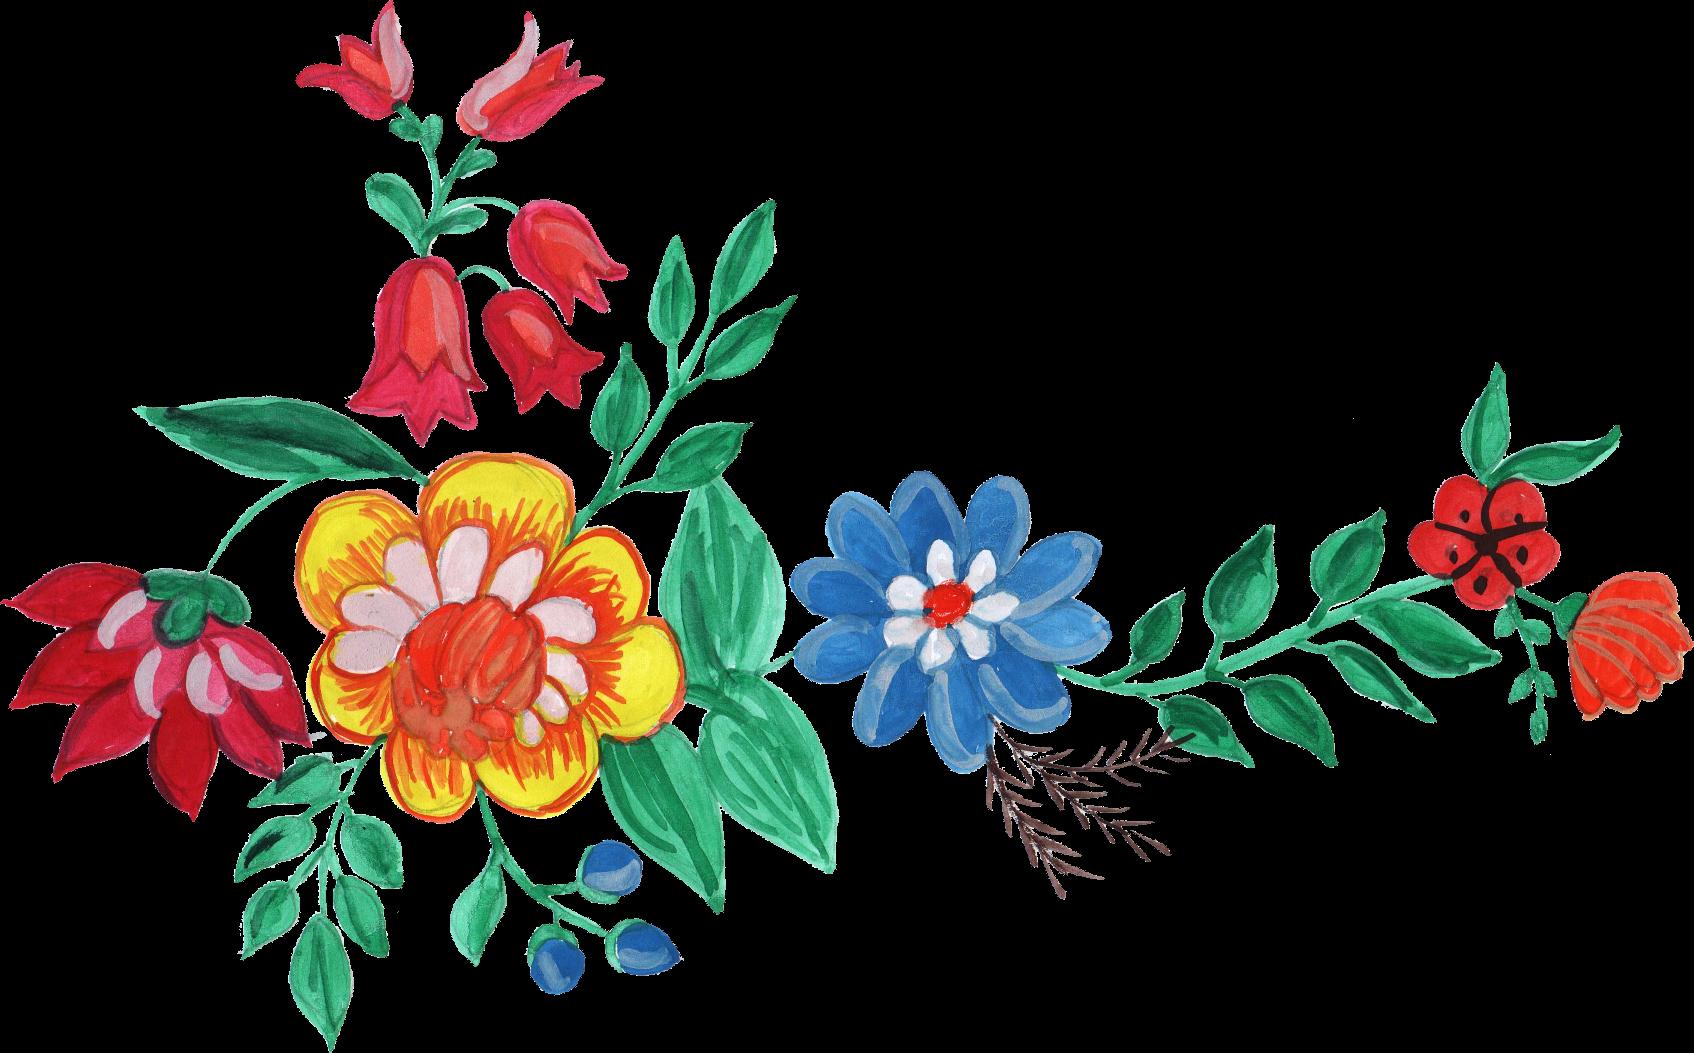 Water color flower clipart svg 5 Watercolor Flower Corner (PNG Transparent) Vol. 2 | OnlyGFX.com svg